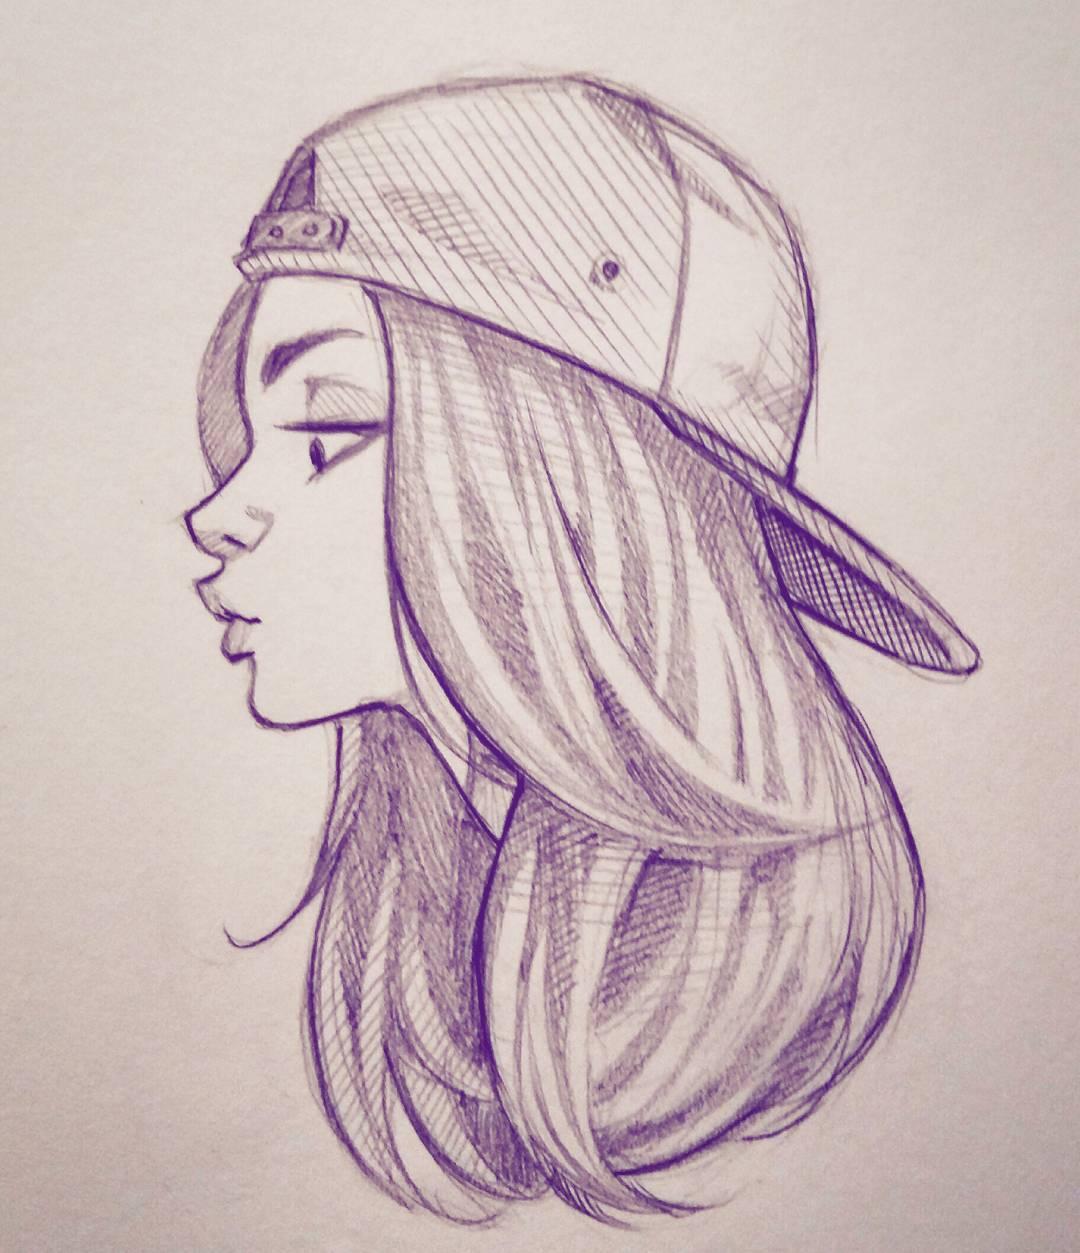 Drawn sanya Of to one Instagram pretty